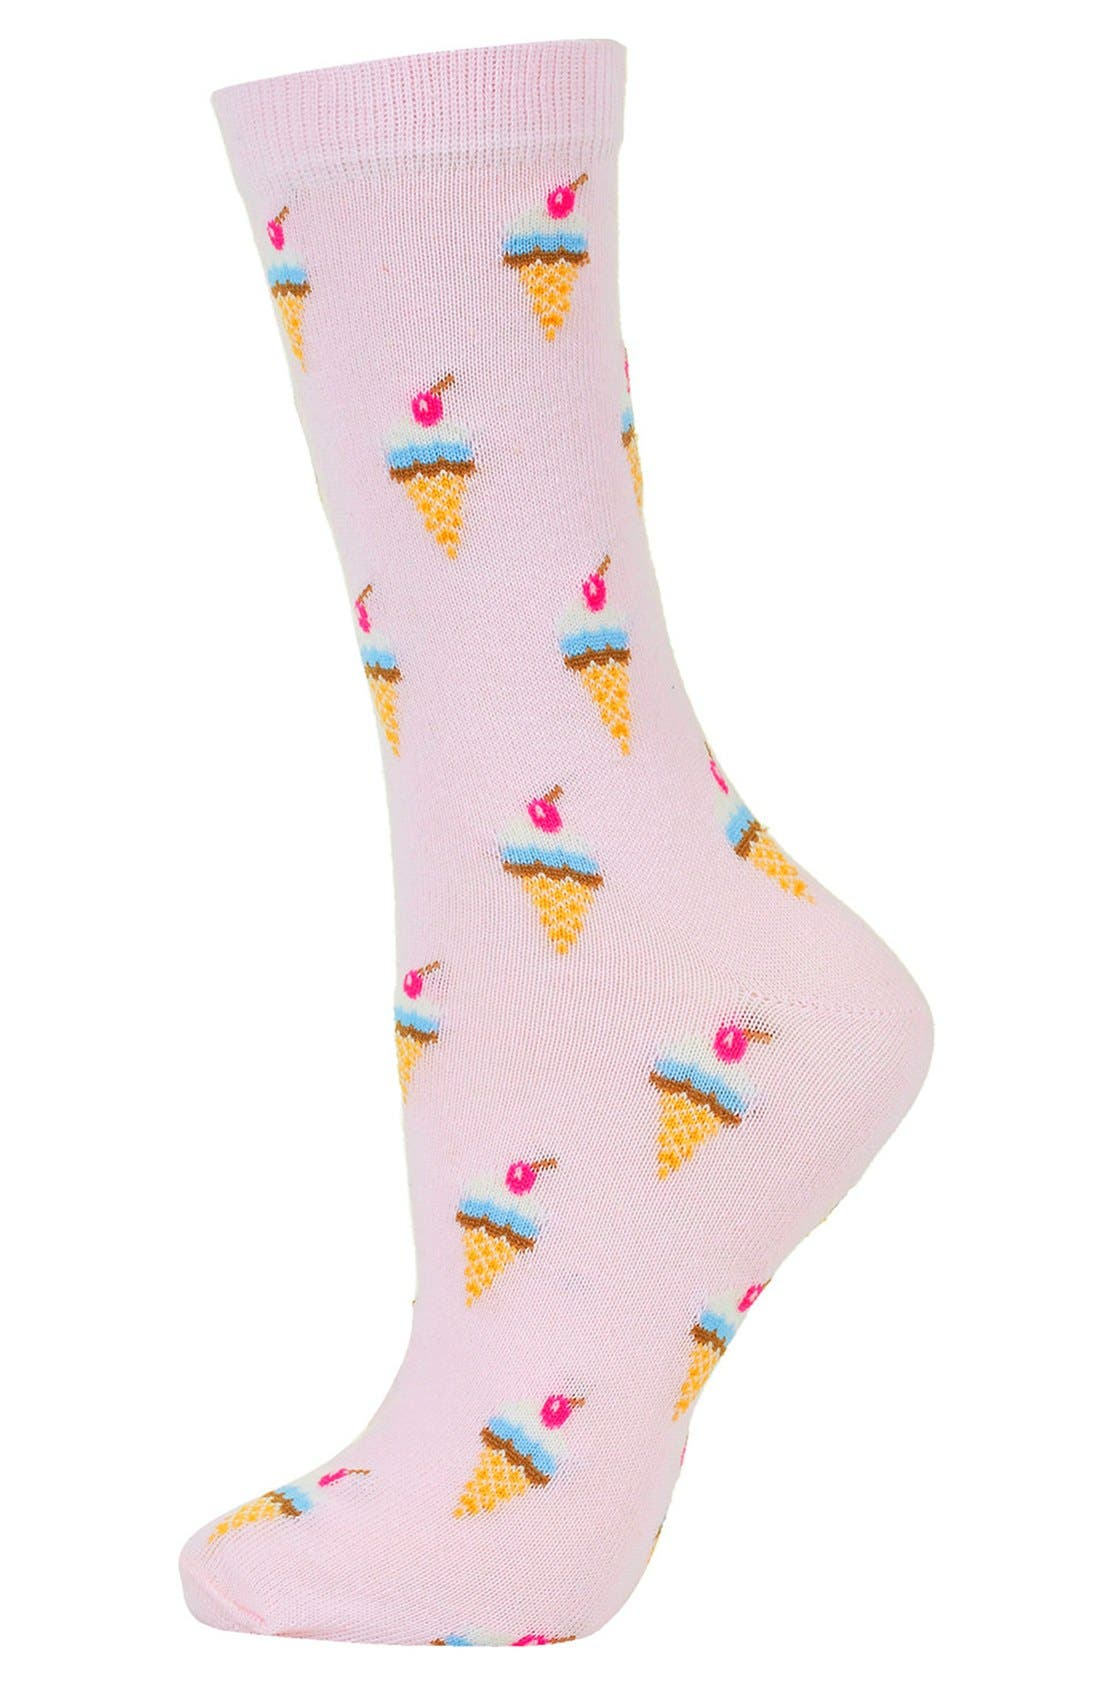 Alternate Image 1 Selected - Topshop Ice Cream Socks